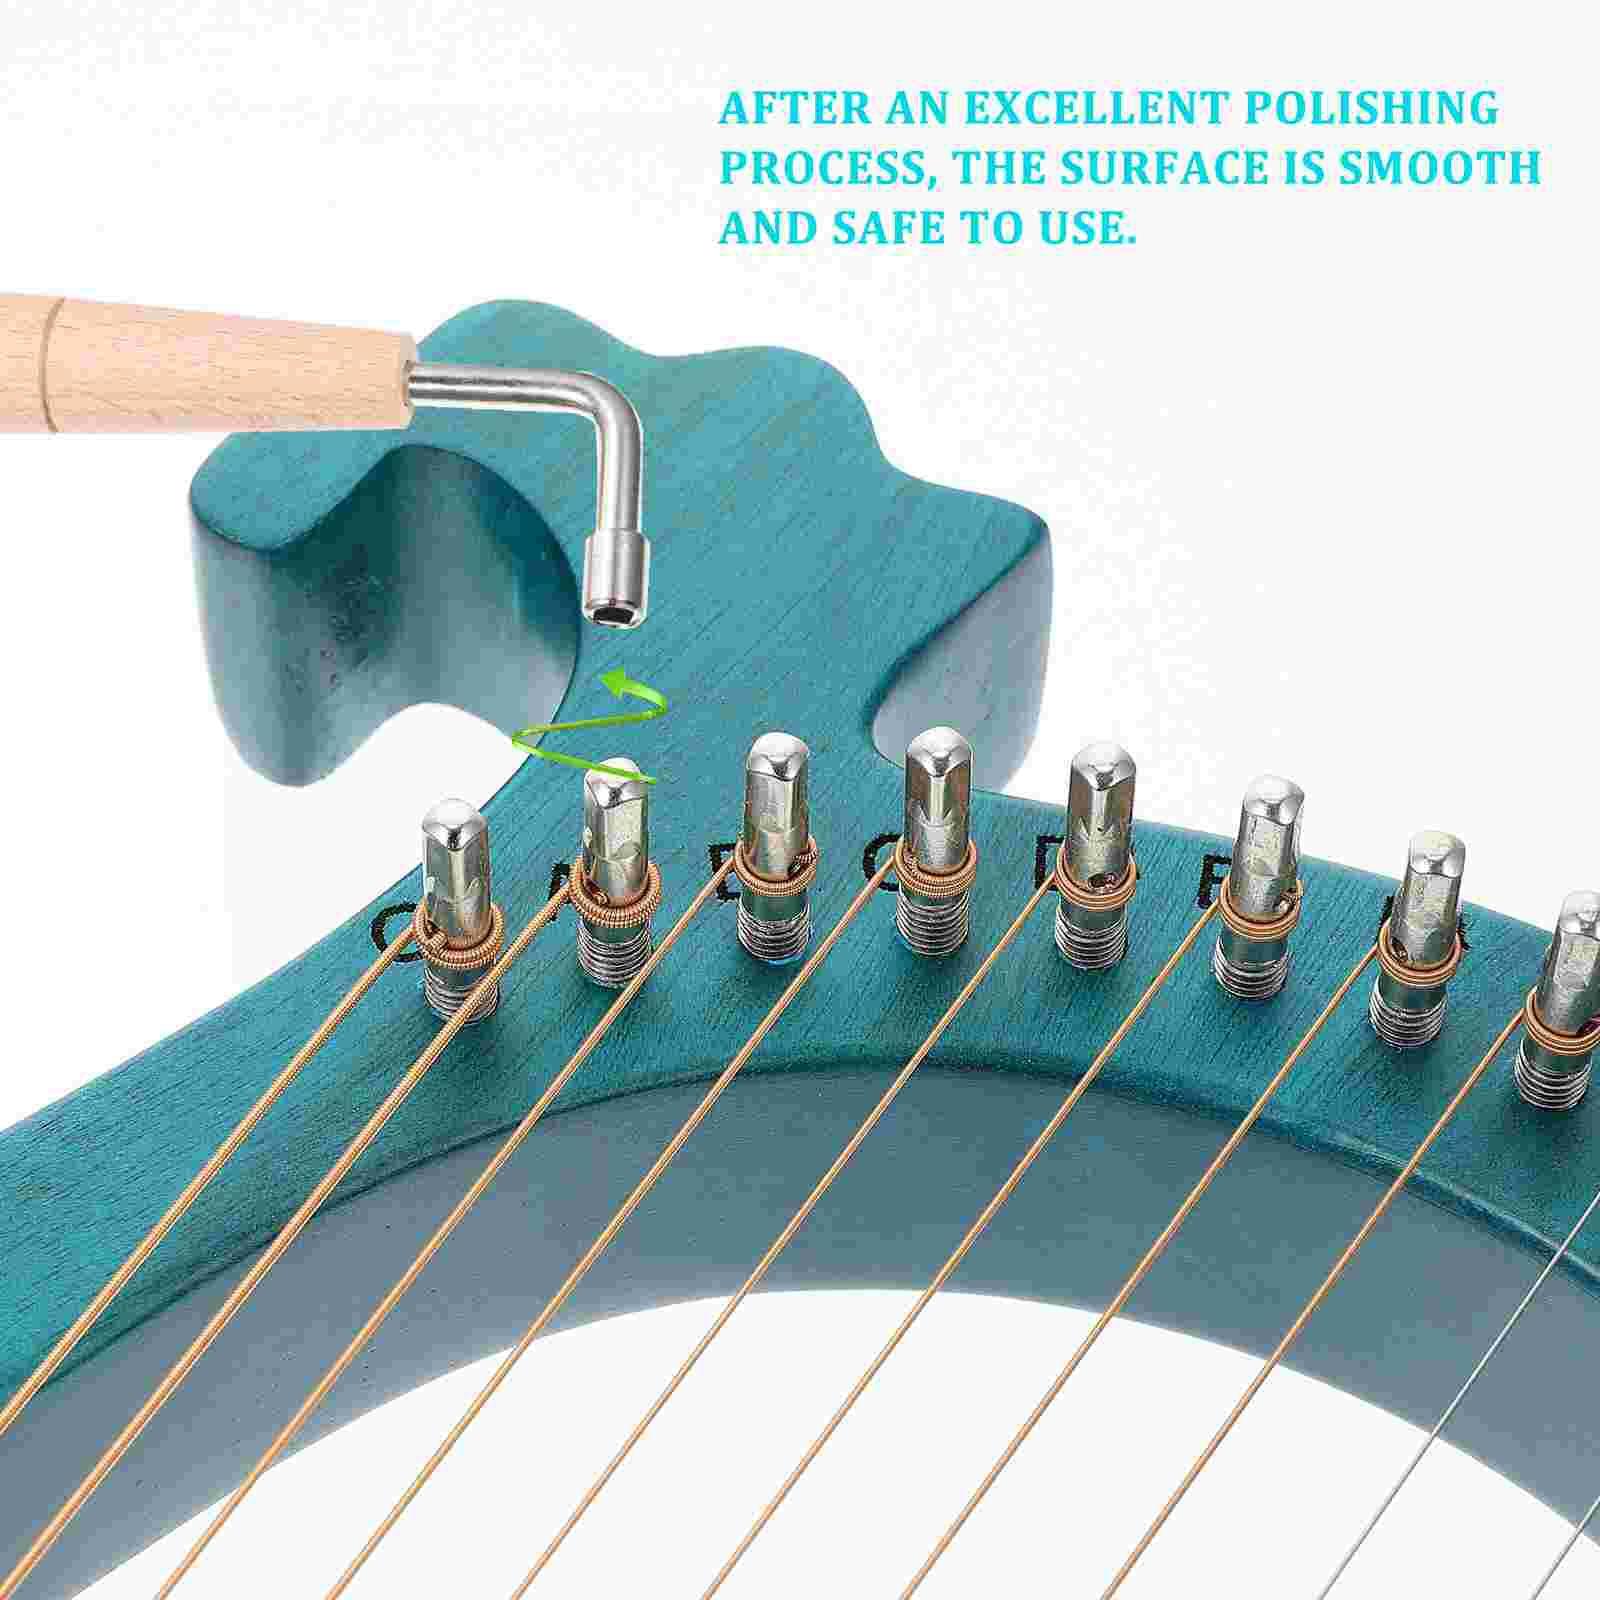 1 Set Lyre Harp 16 Metal Strings Handheld Harp Wood String Instrument (Blue) enlarge